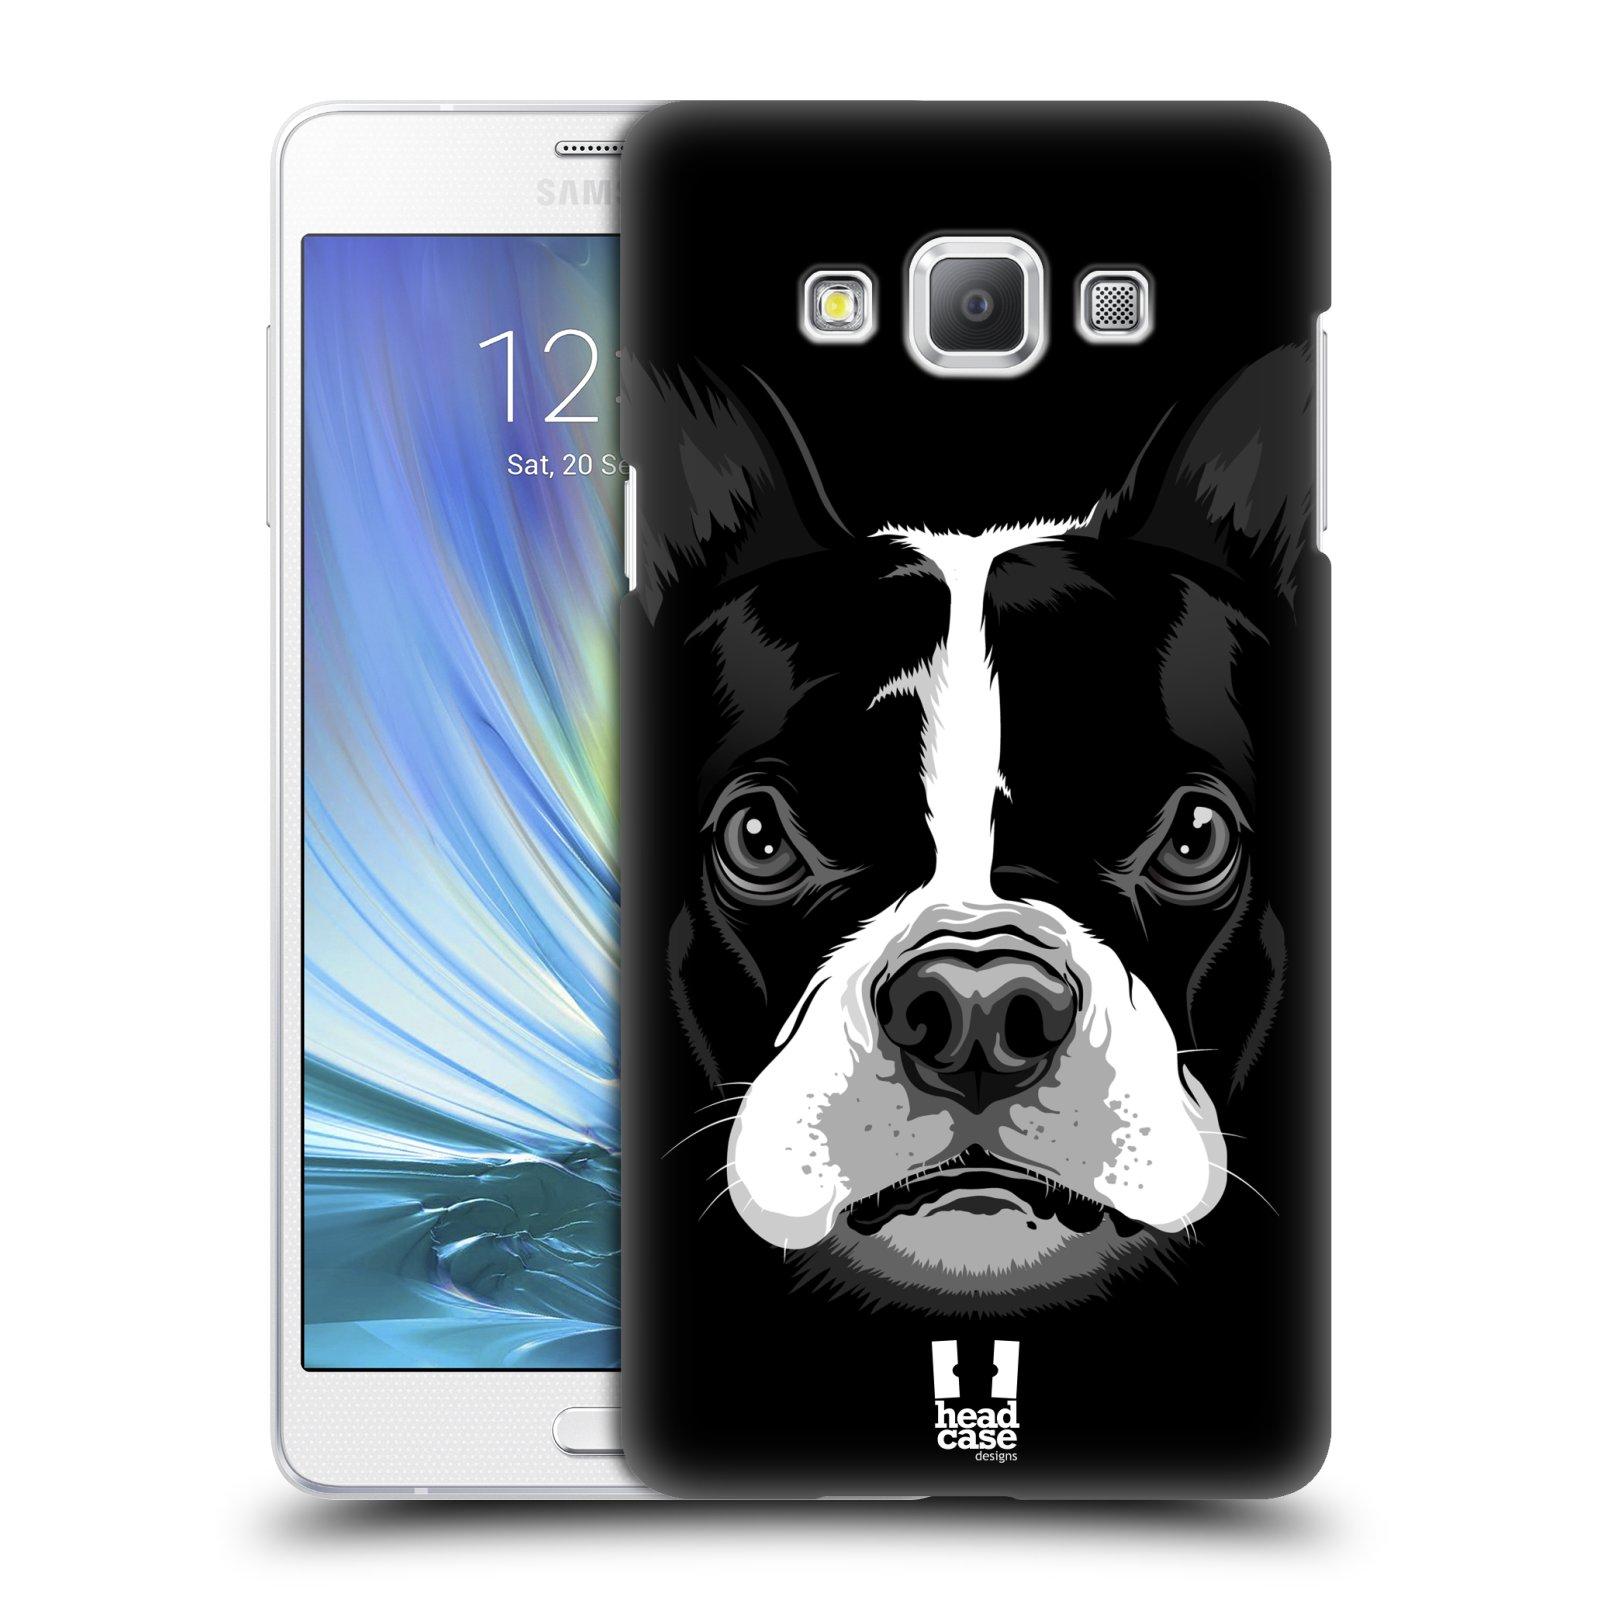 HEAD CASE plastový obal na mobil SAMSUNG GALAXY A7 vzor Zvíře kreslená tvář 2 buldok